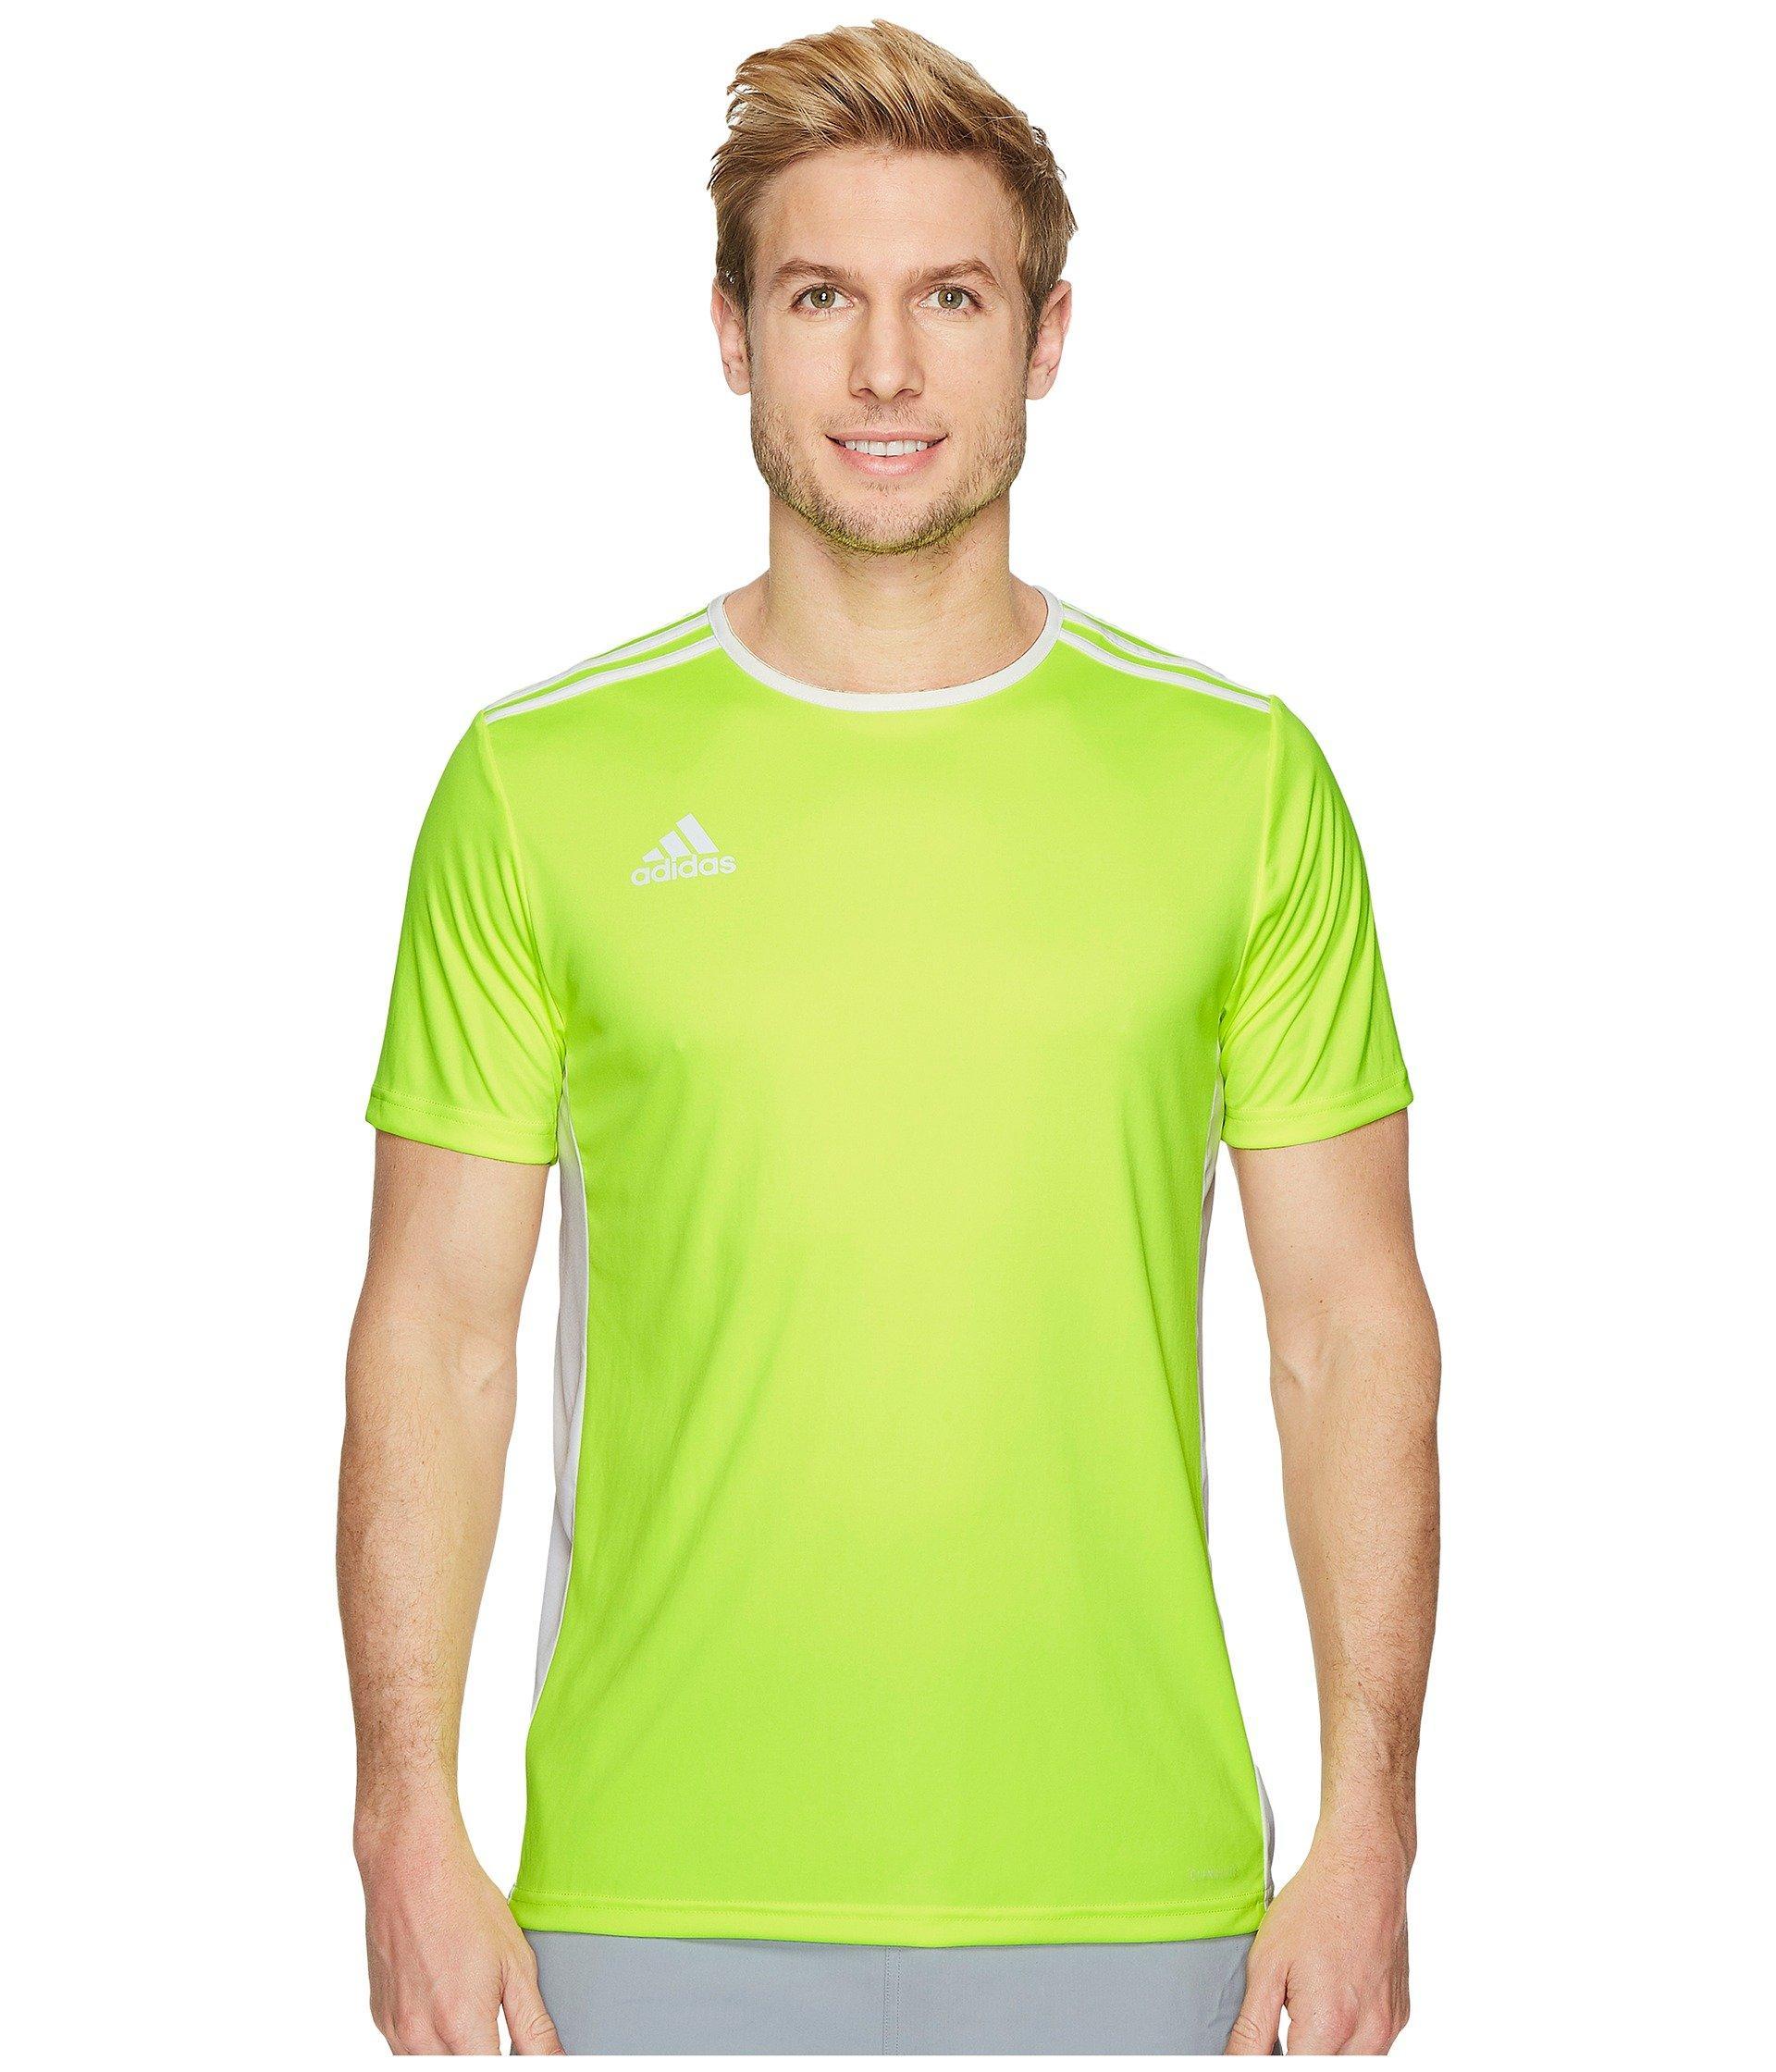 Adidas Originals , Solar Yellow/white | ModeSens